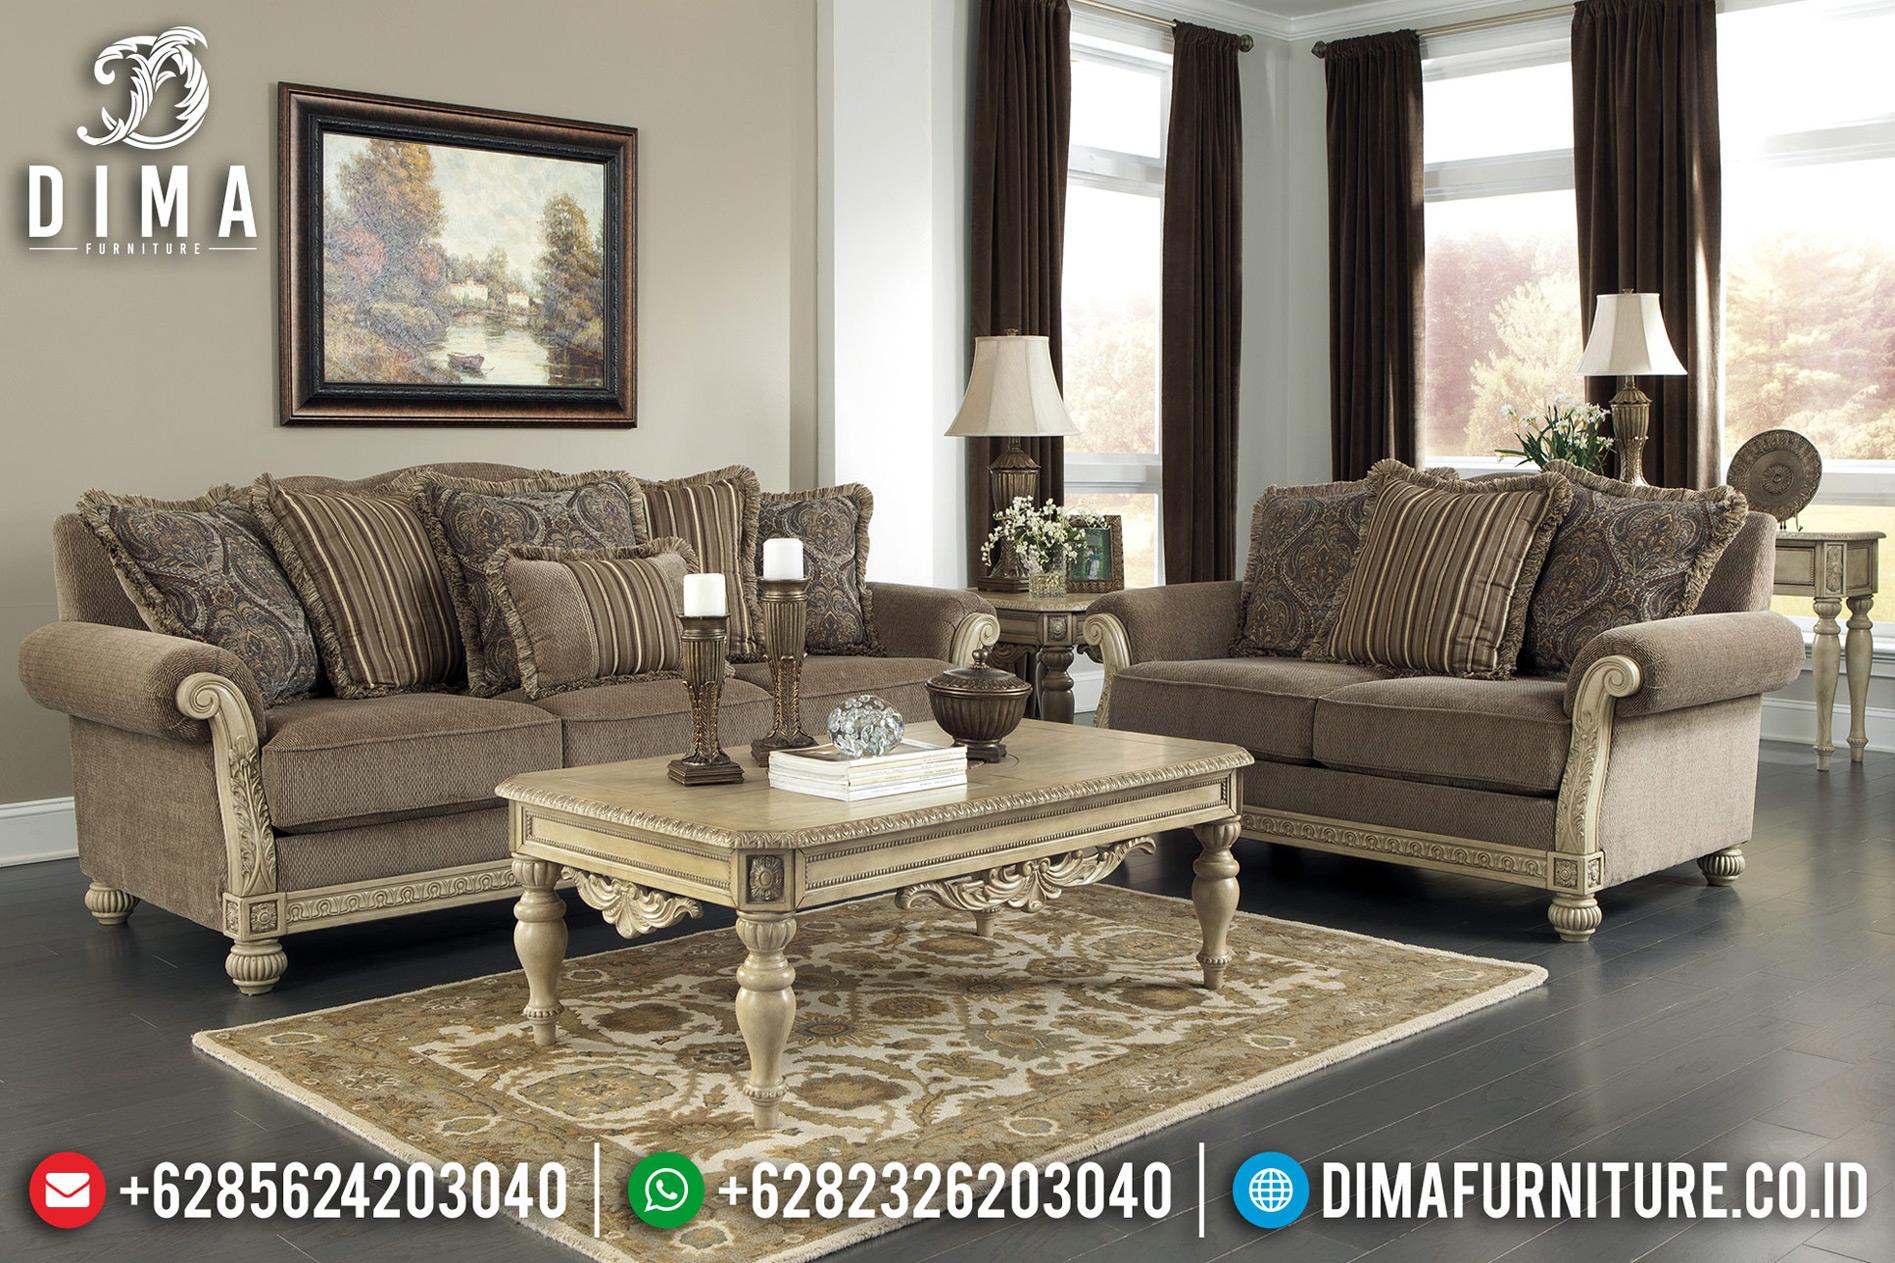 Harga Sofa Tamu Minimalis White Duco Ivory Luxury Classic Carving BT-0638